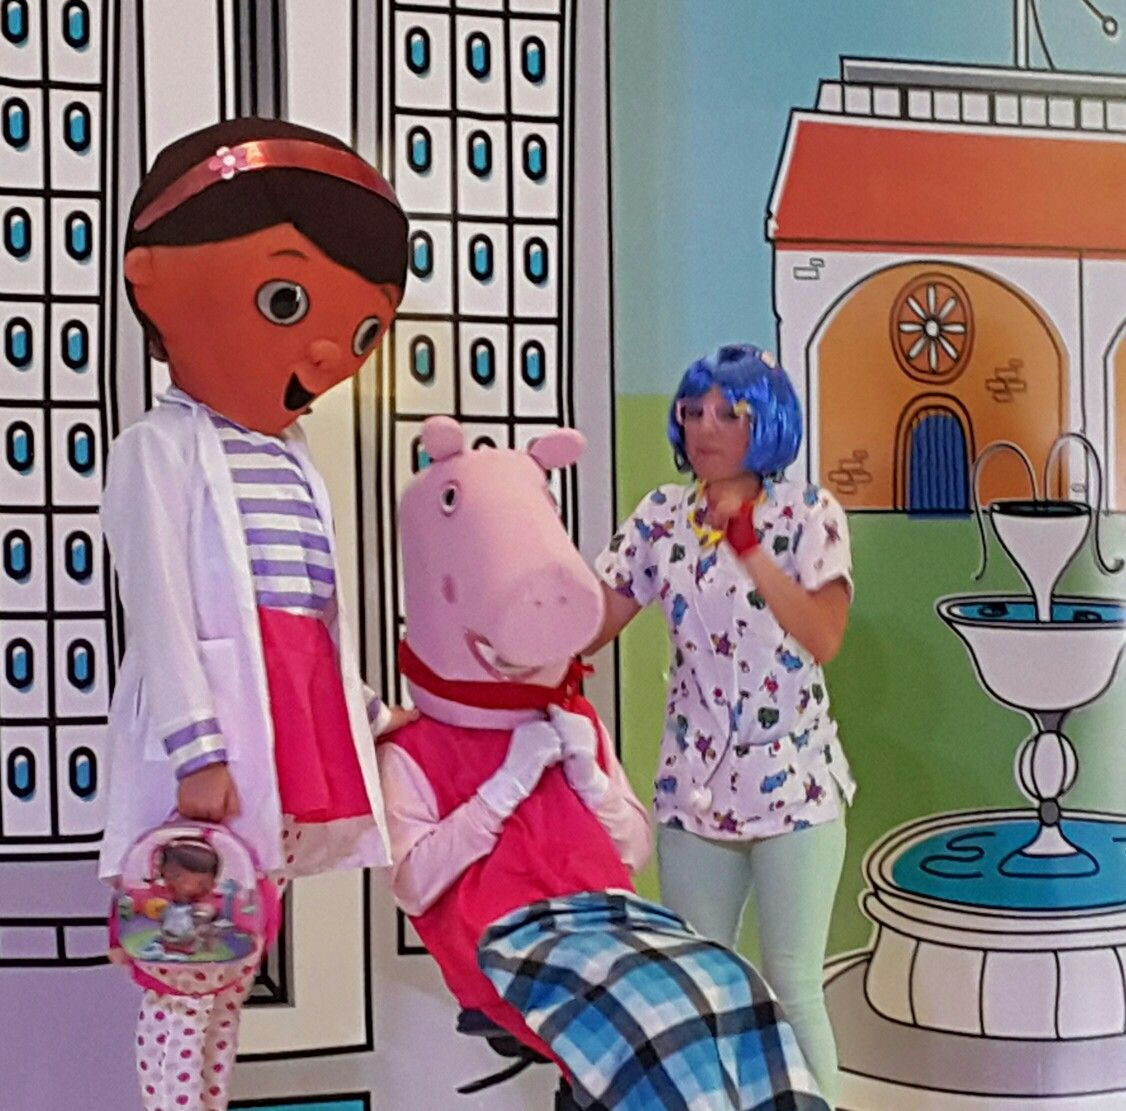 Dra Juguetes, Peppa Pig y nuestra animadora Kitty 8831-3232